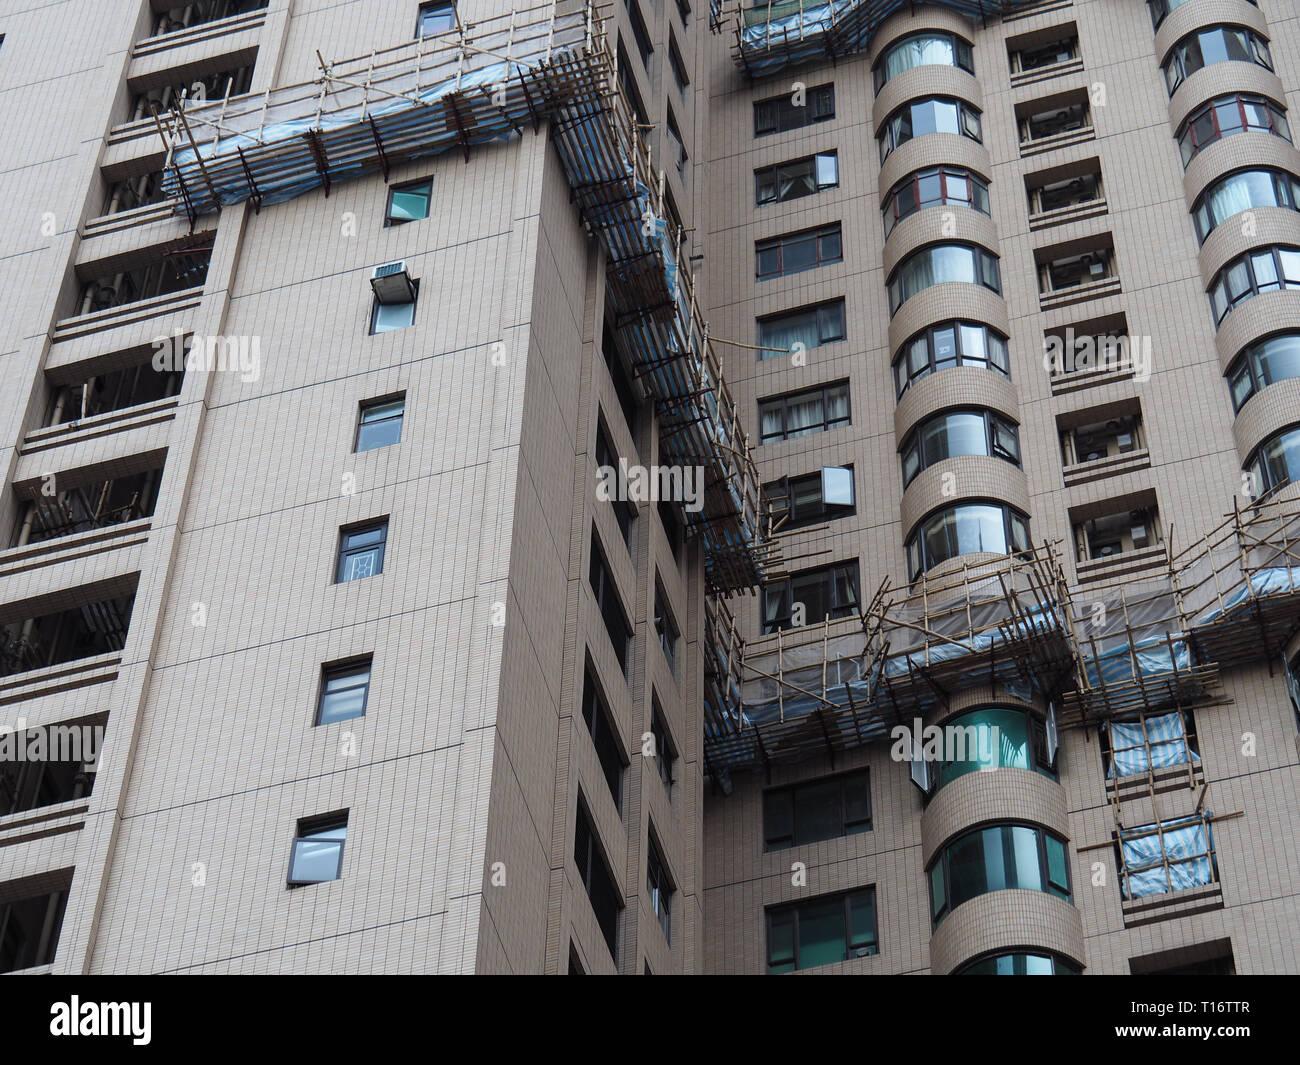 Central, Hong Kong - 1 November 2017: scaffolding of bamboo provide a platform for high-altitude maintenance work at several apartments. - Stock Image